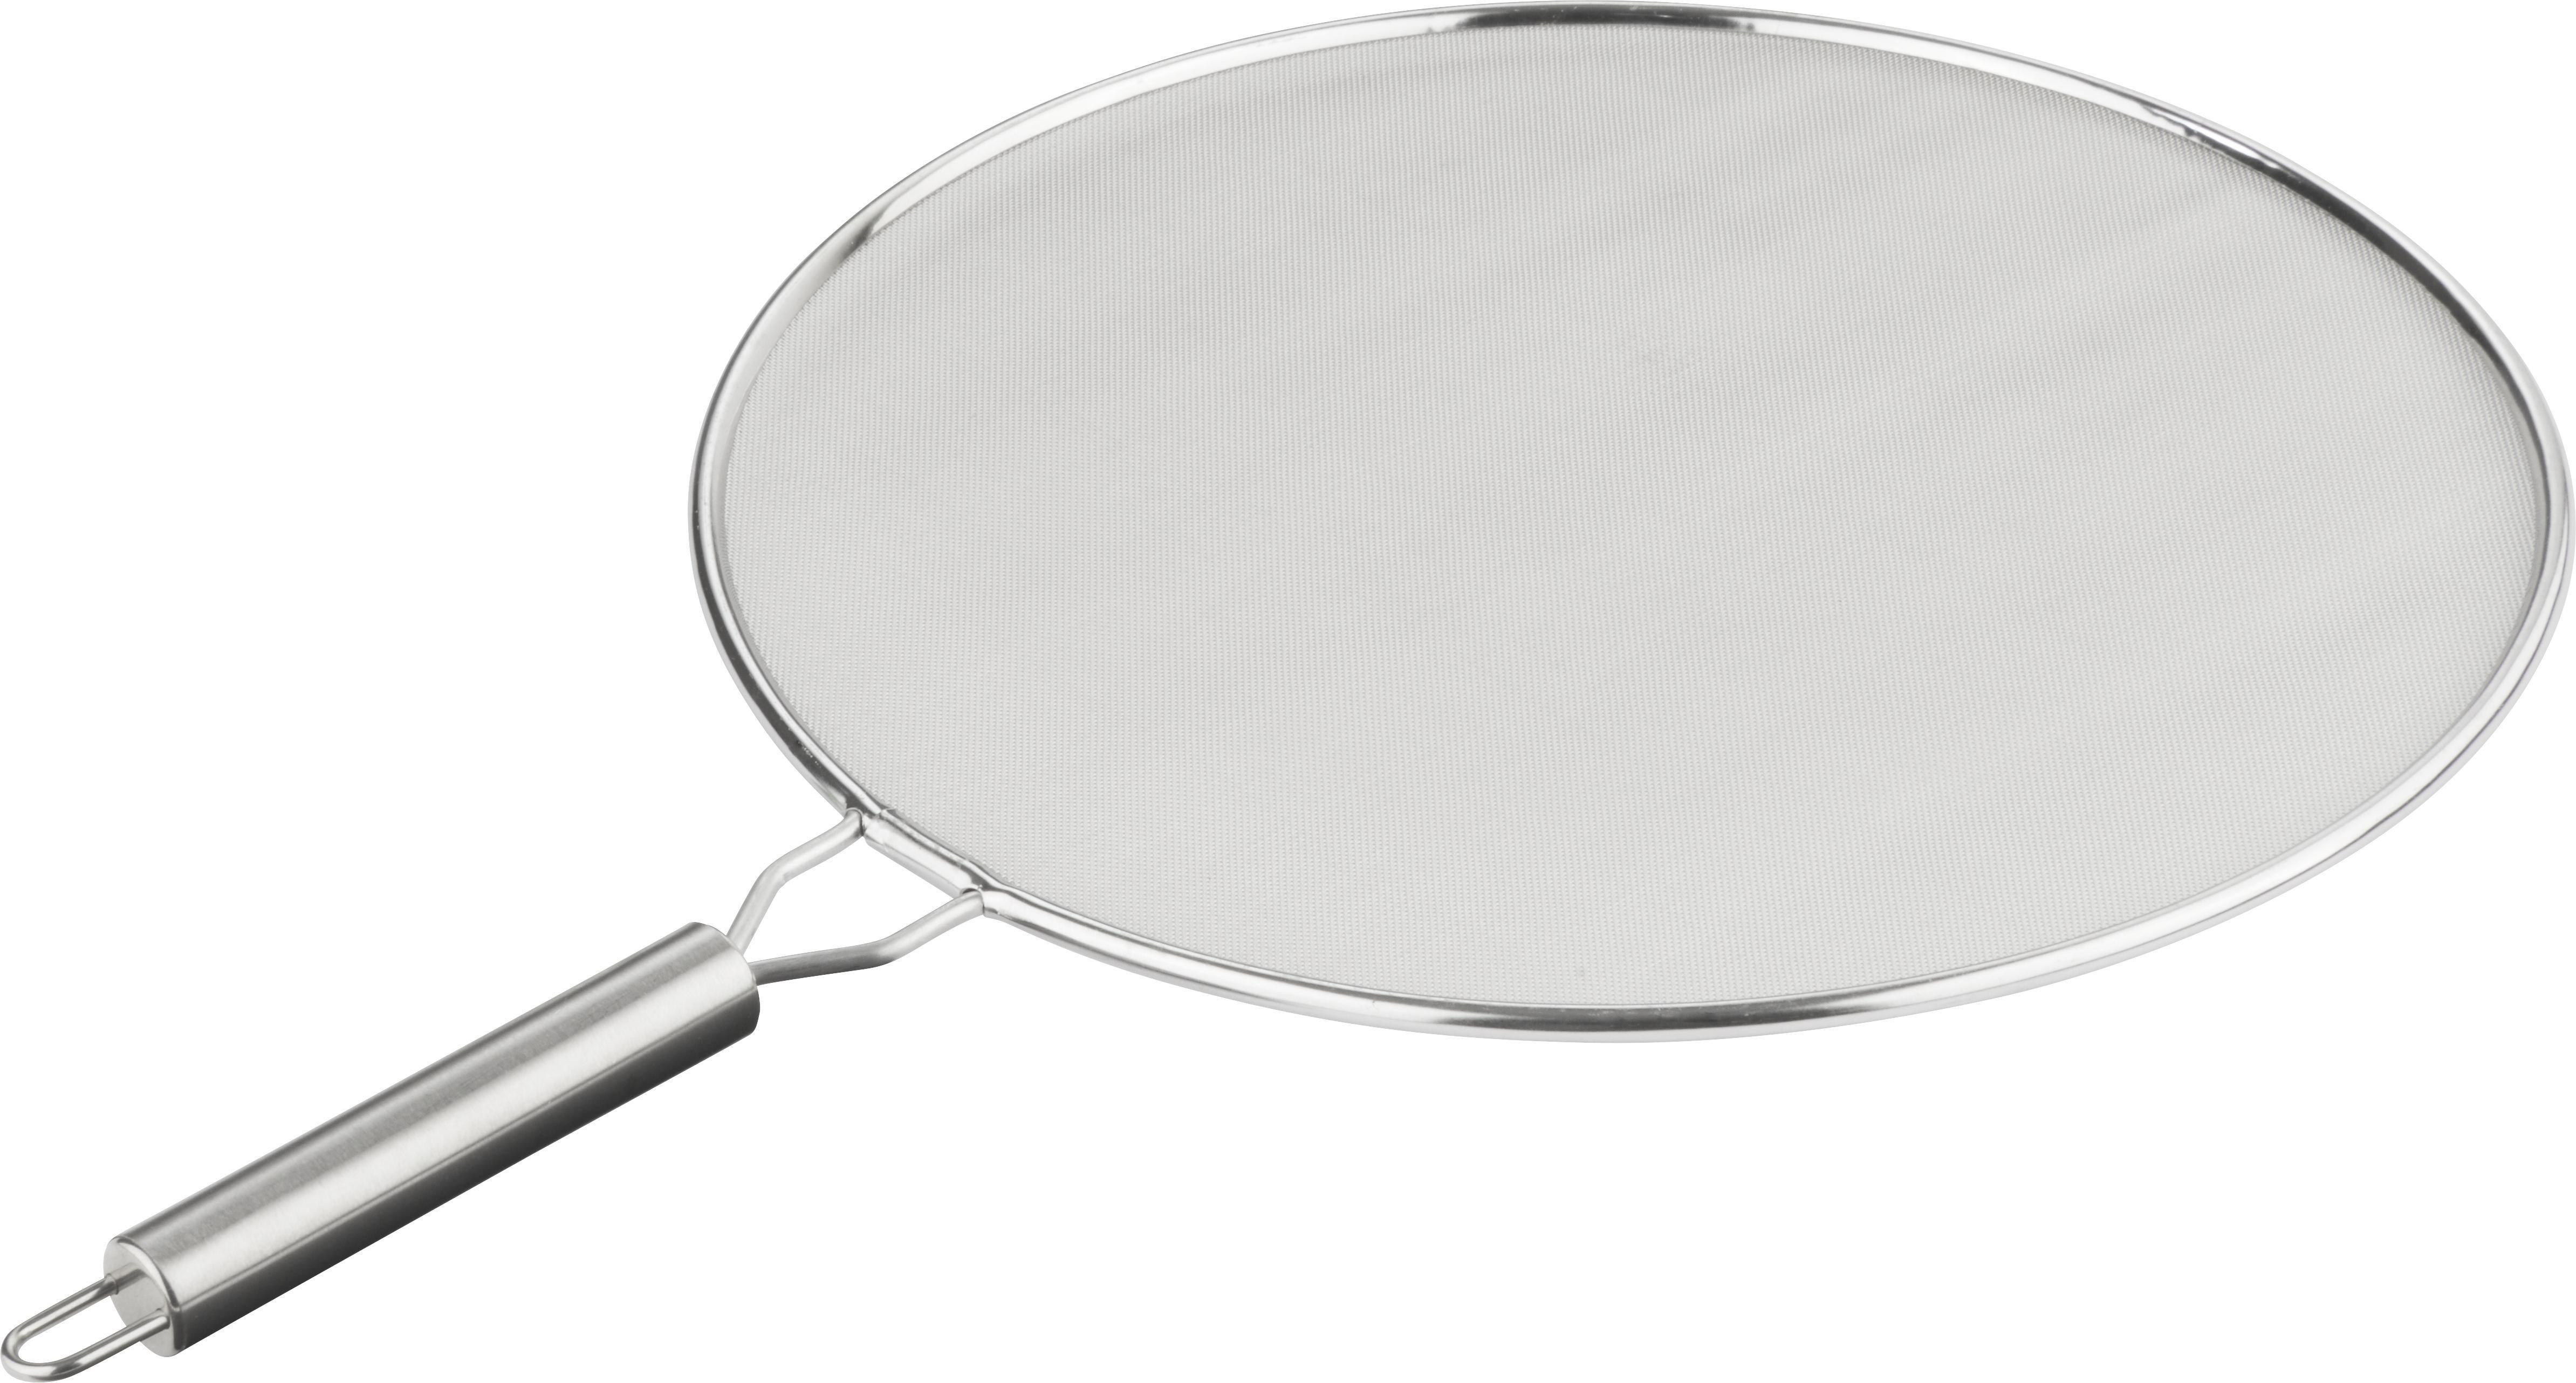 Spritzschutz Mika in Silber, ca. 29cm - Edelstahlfarben, Metall (29cm) - MÖMAX modern living